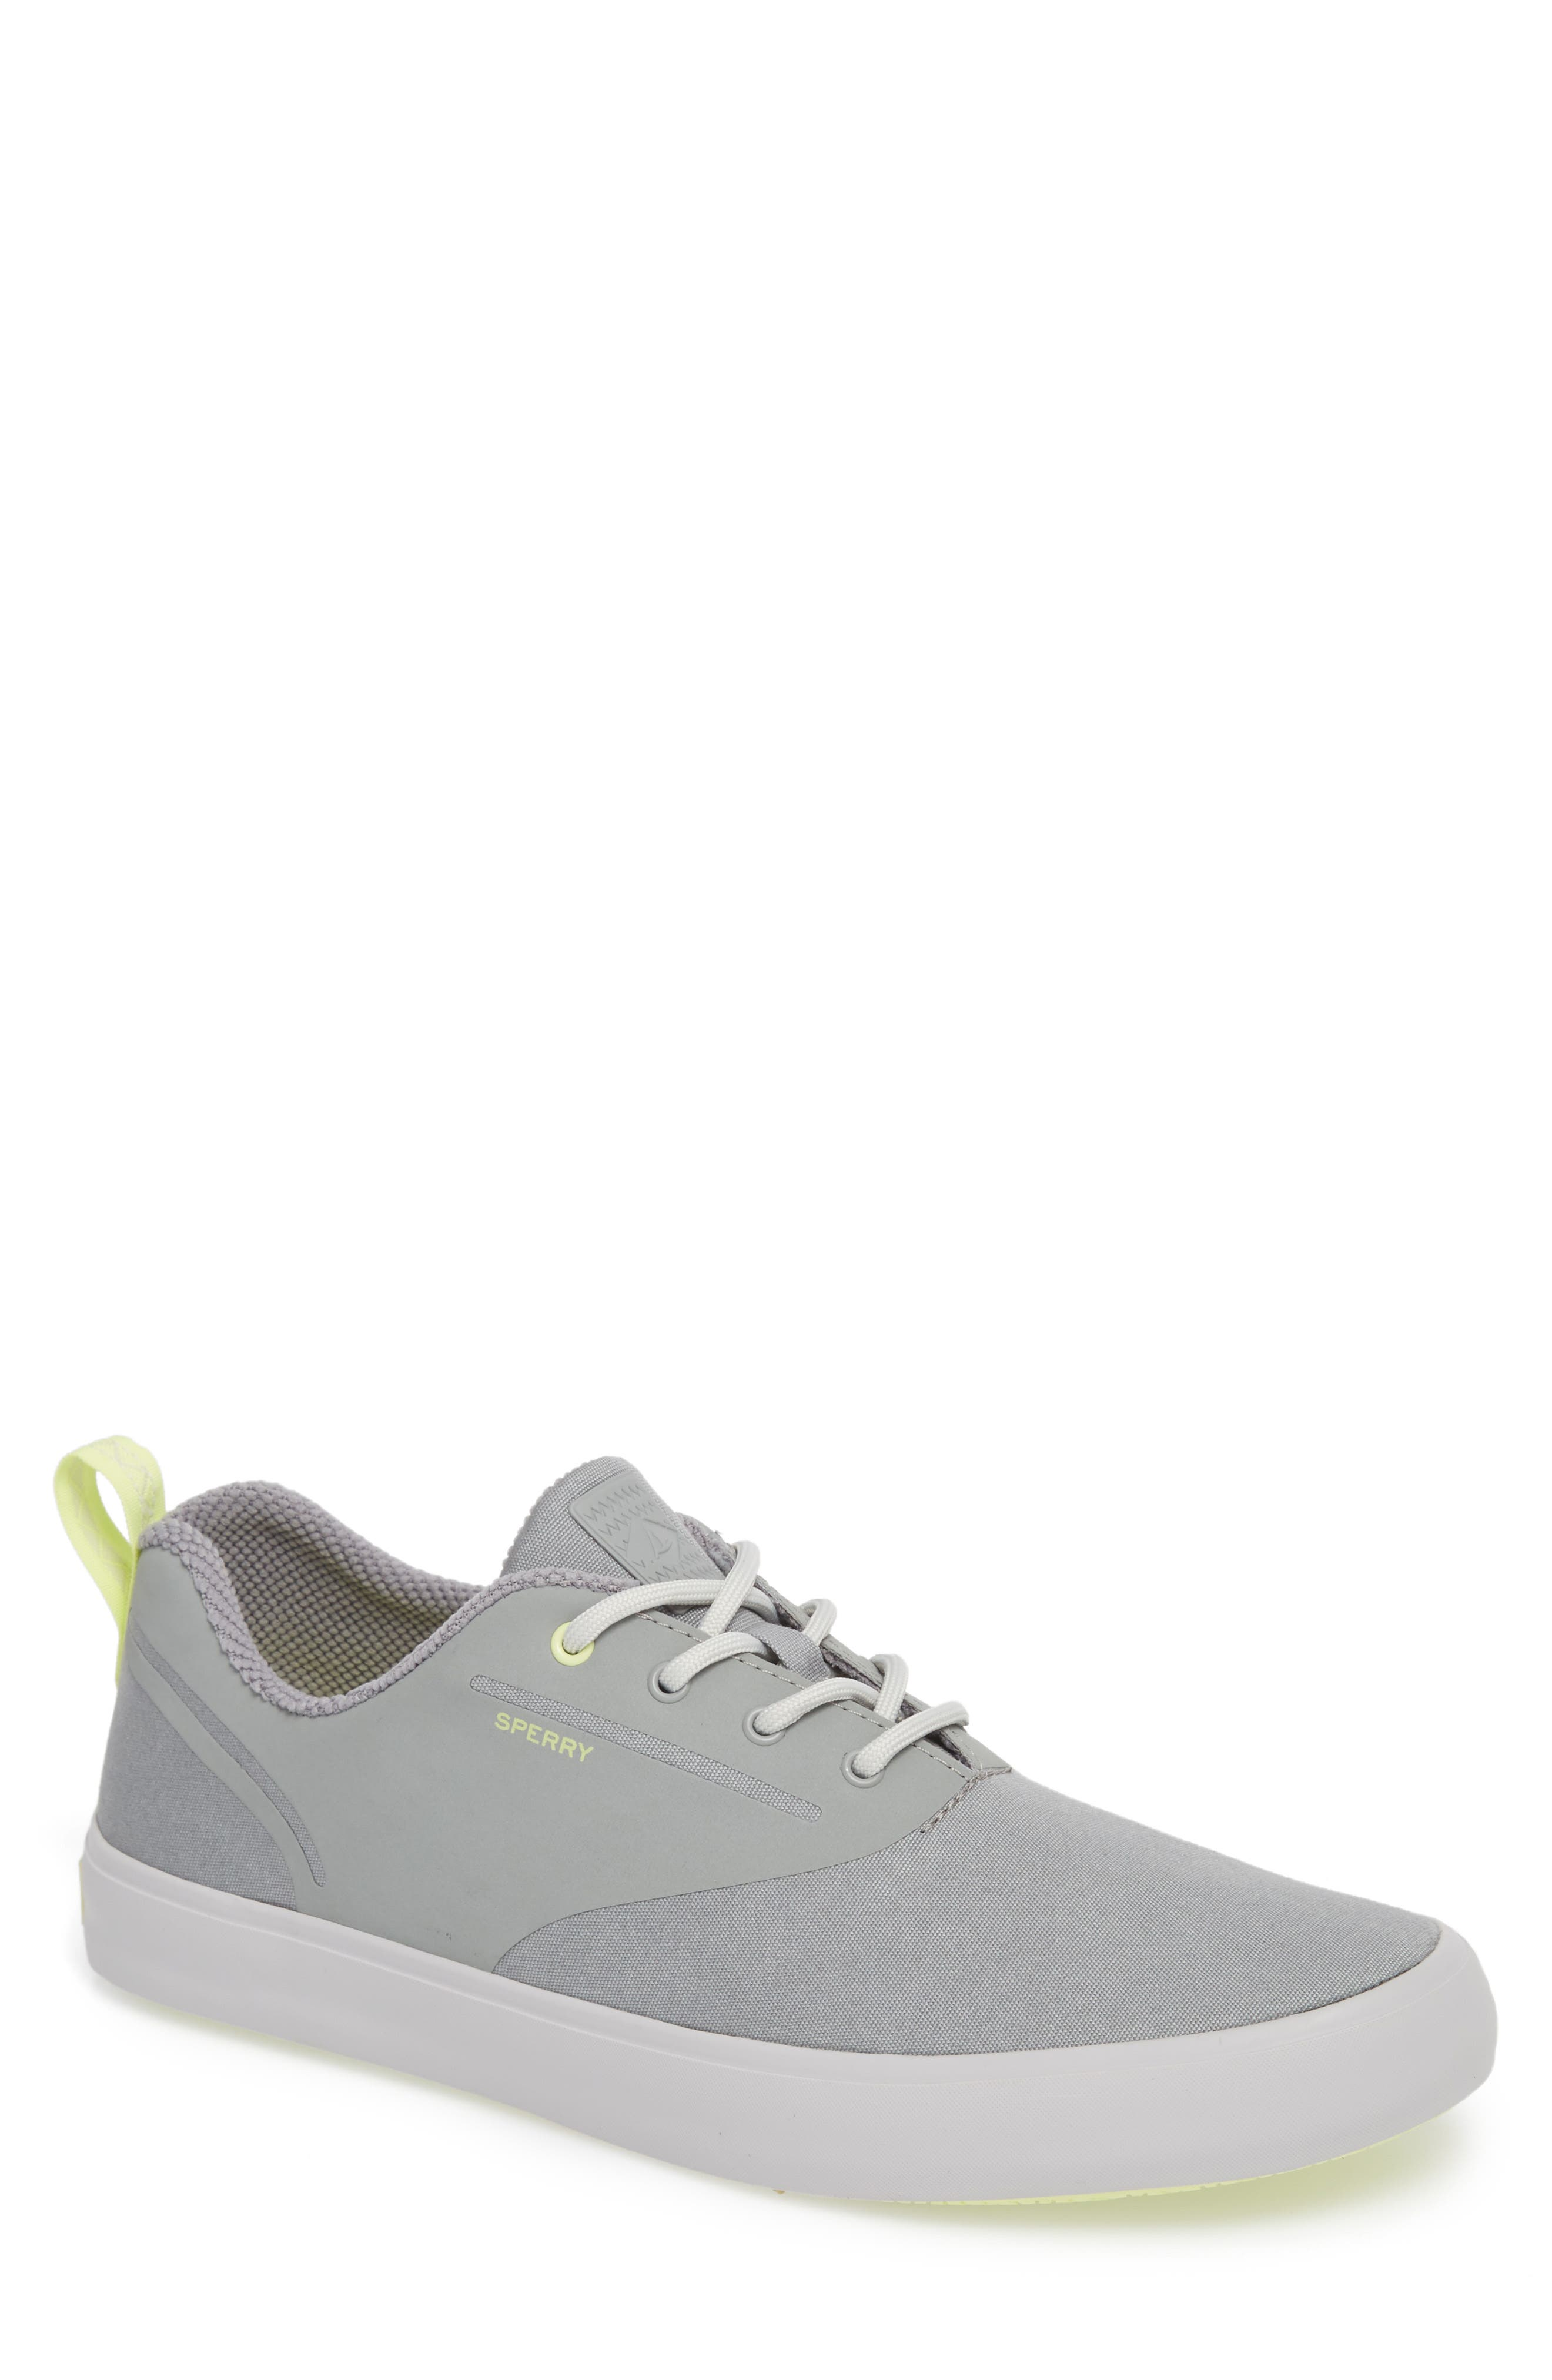 SPERRY, Flex Deck CVO Sneaker, Main thumbnail 1, color, GREY